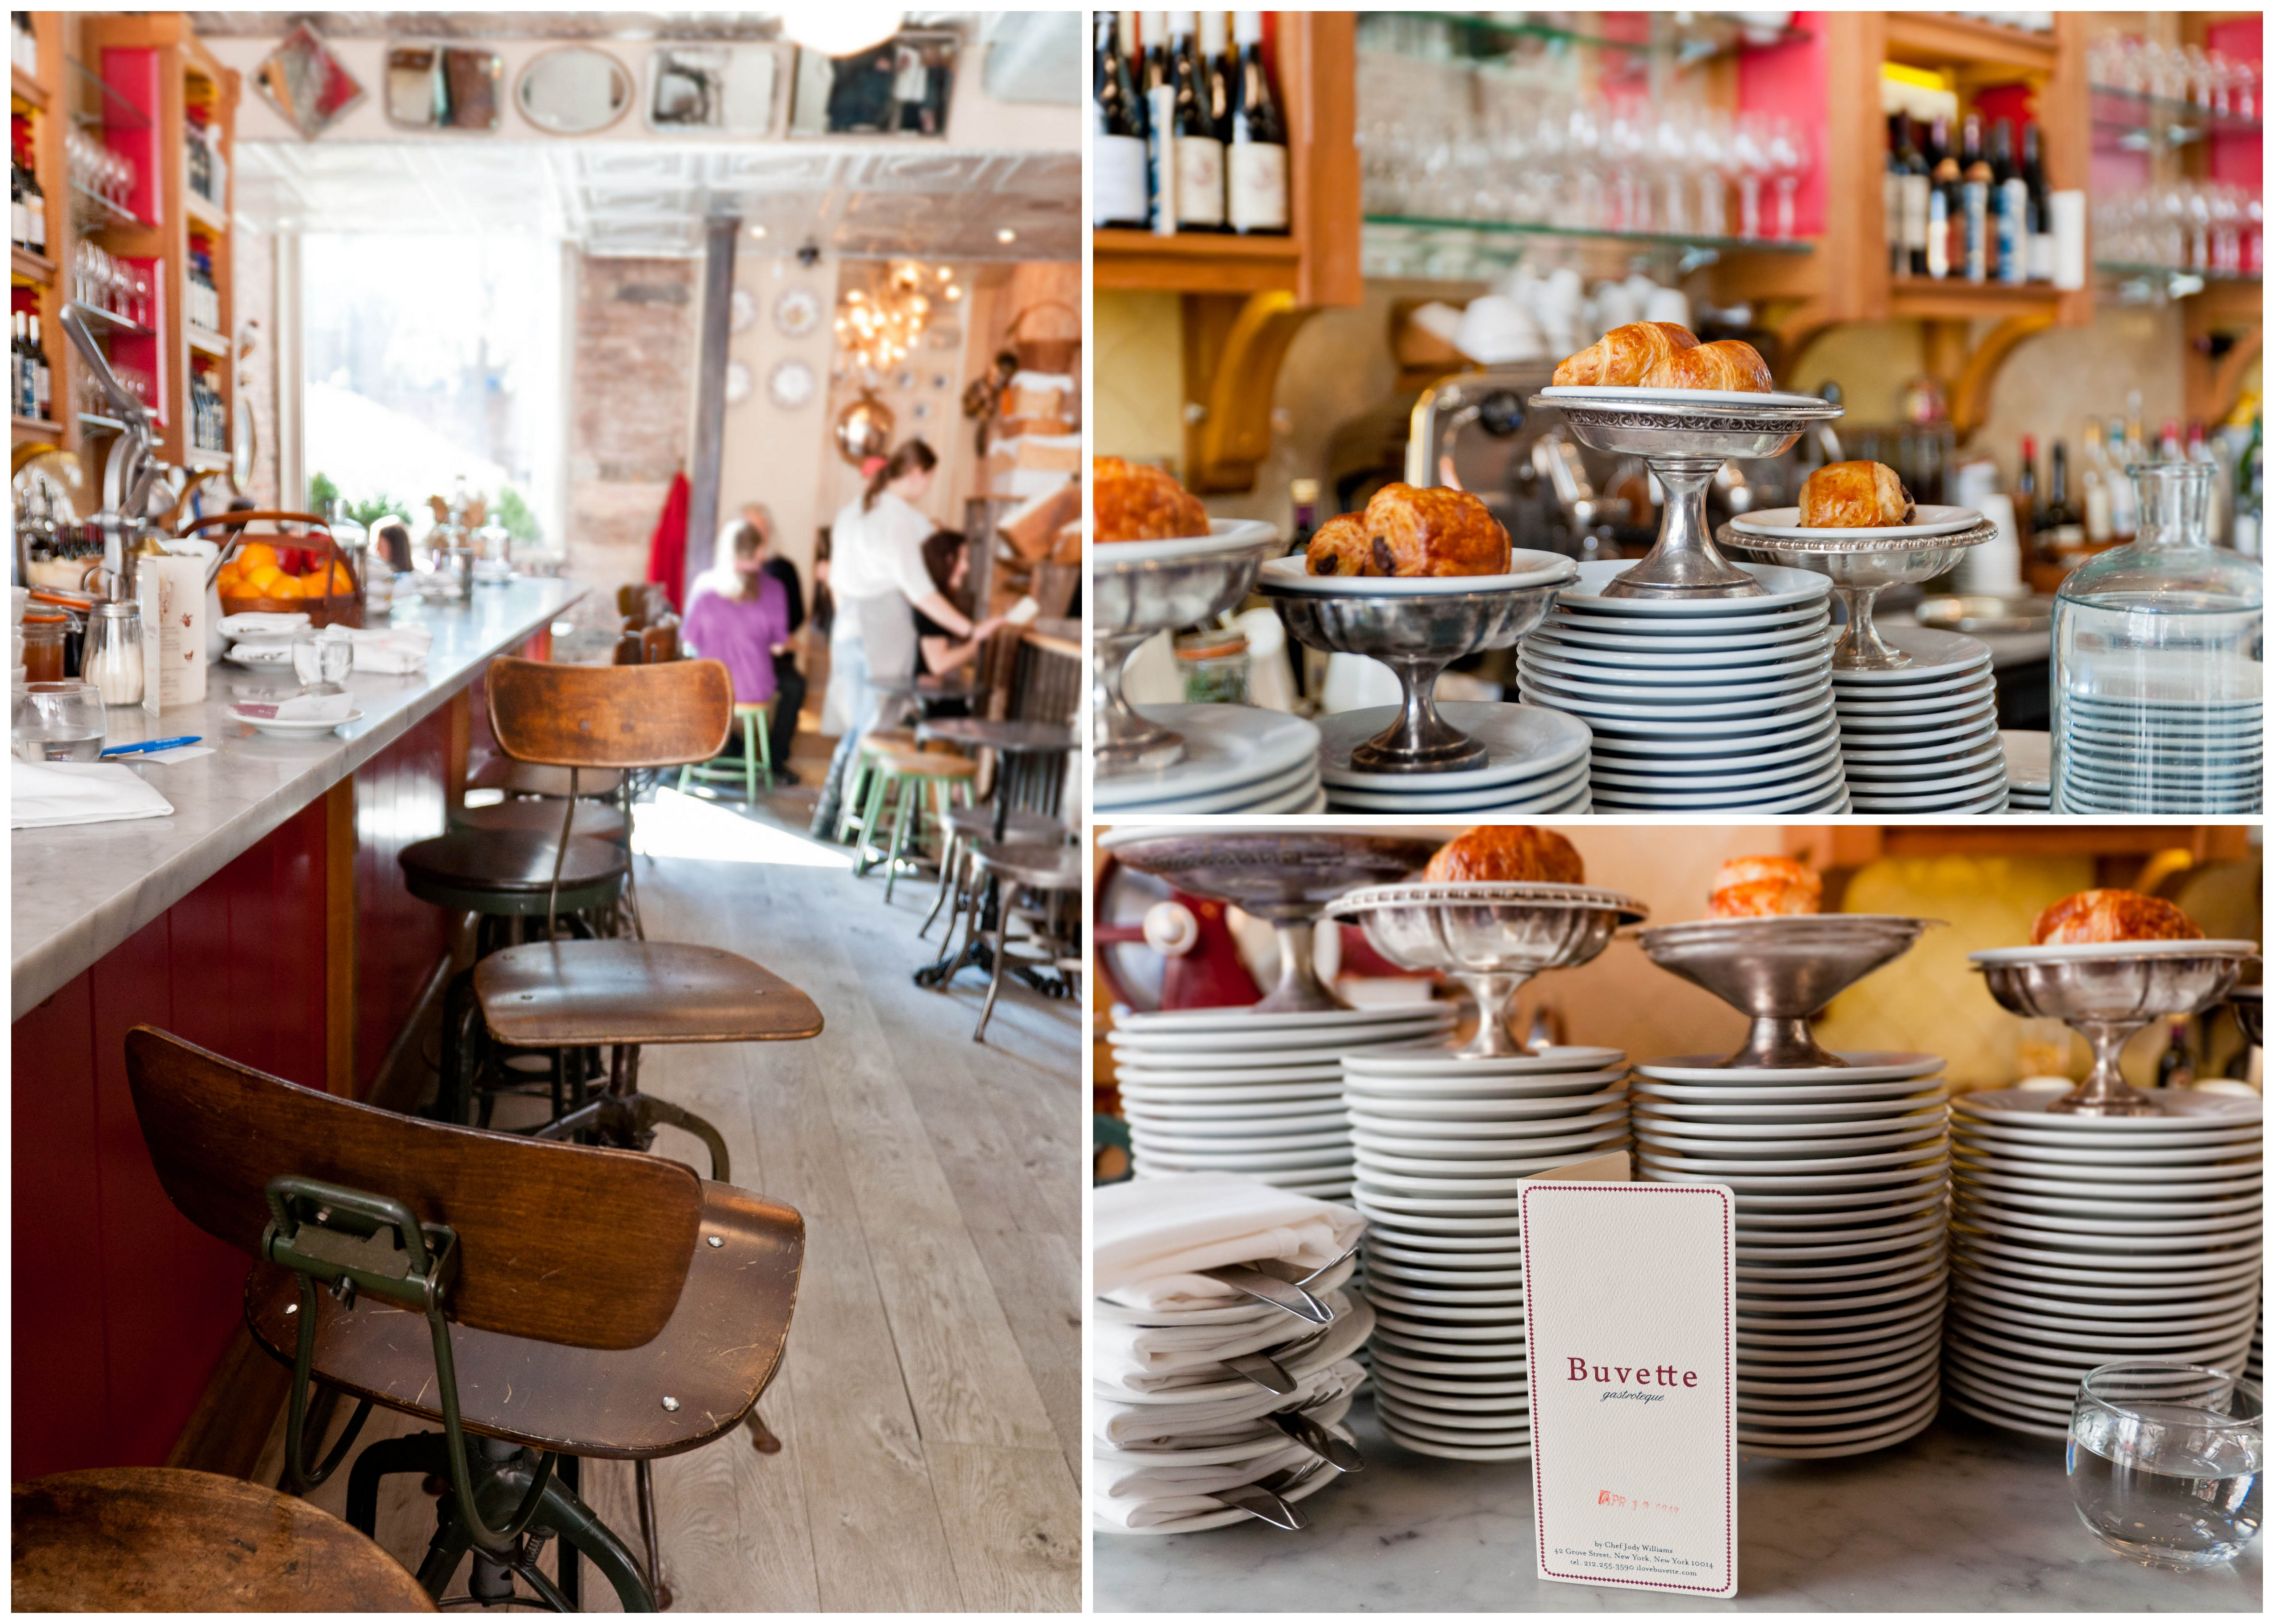 Buvette Restaurant Paris